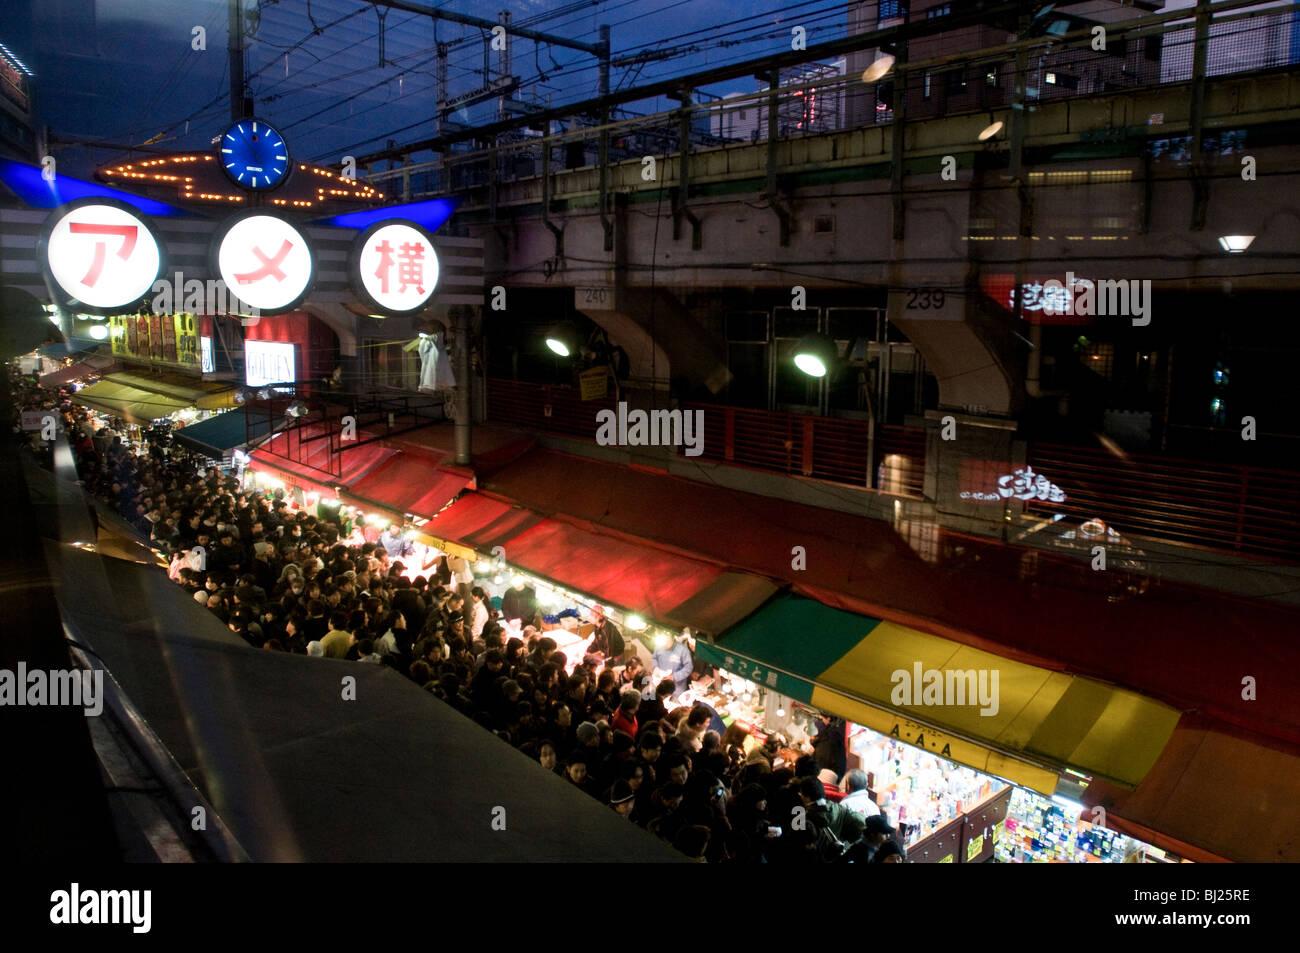 Ameyoko capodanno shopping, Tokyo Giappone. Foto Stock